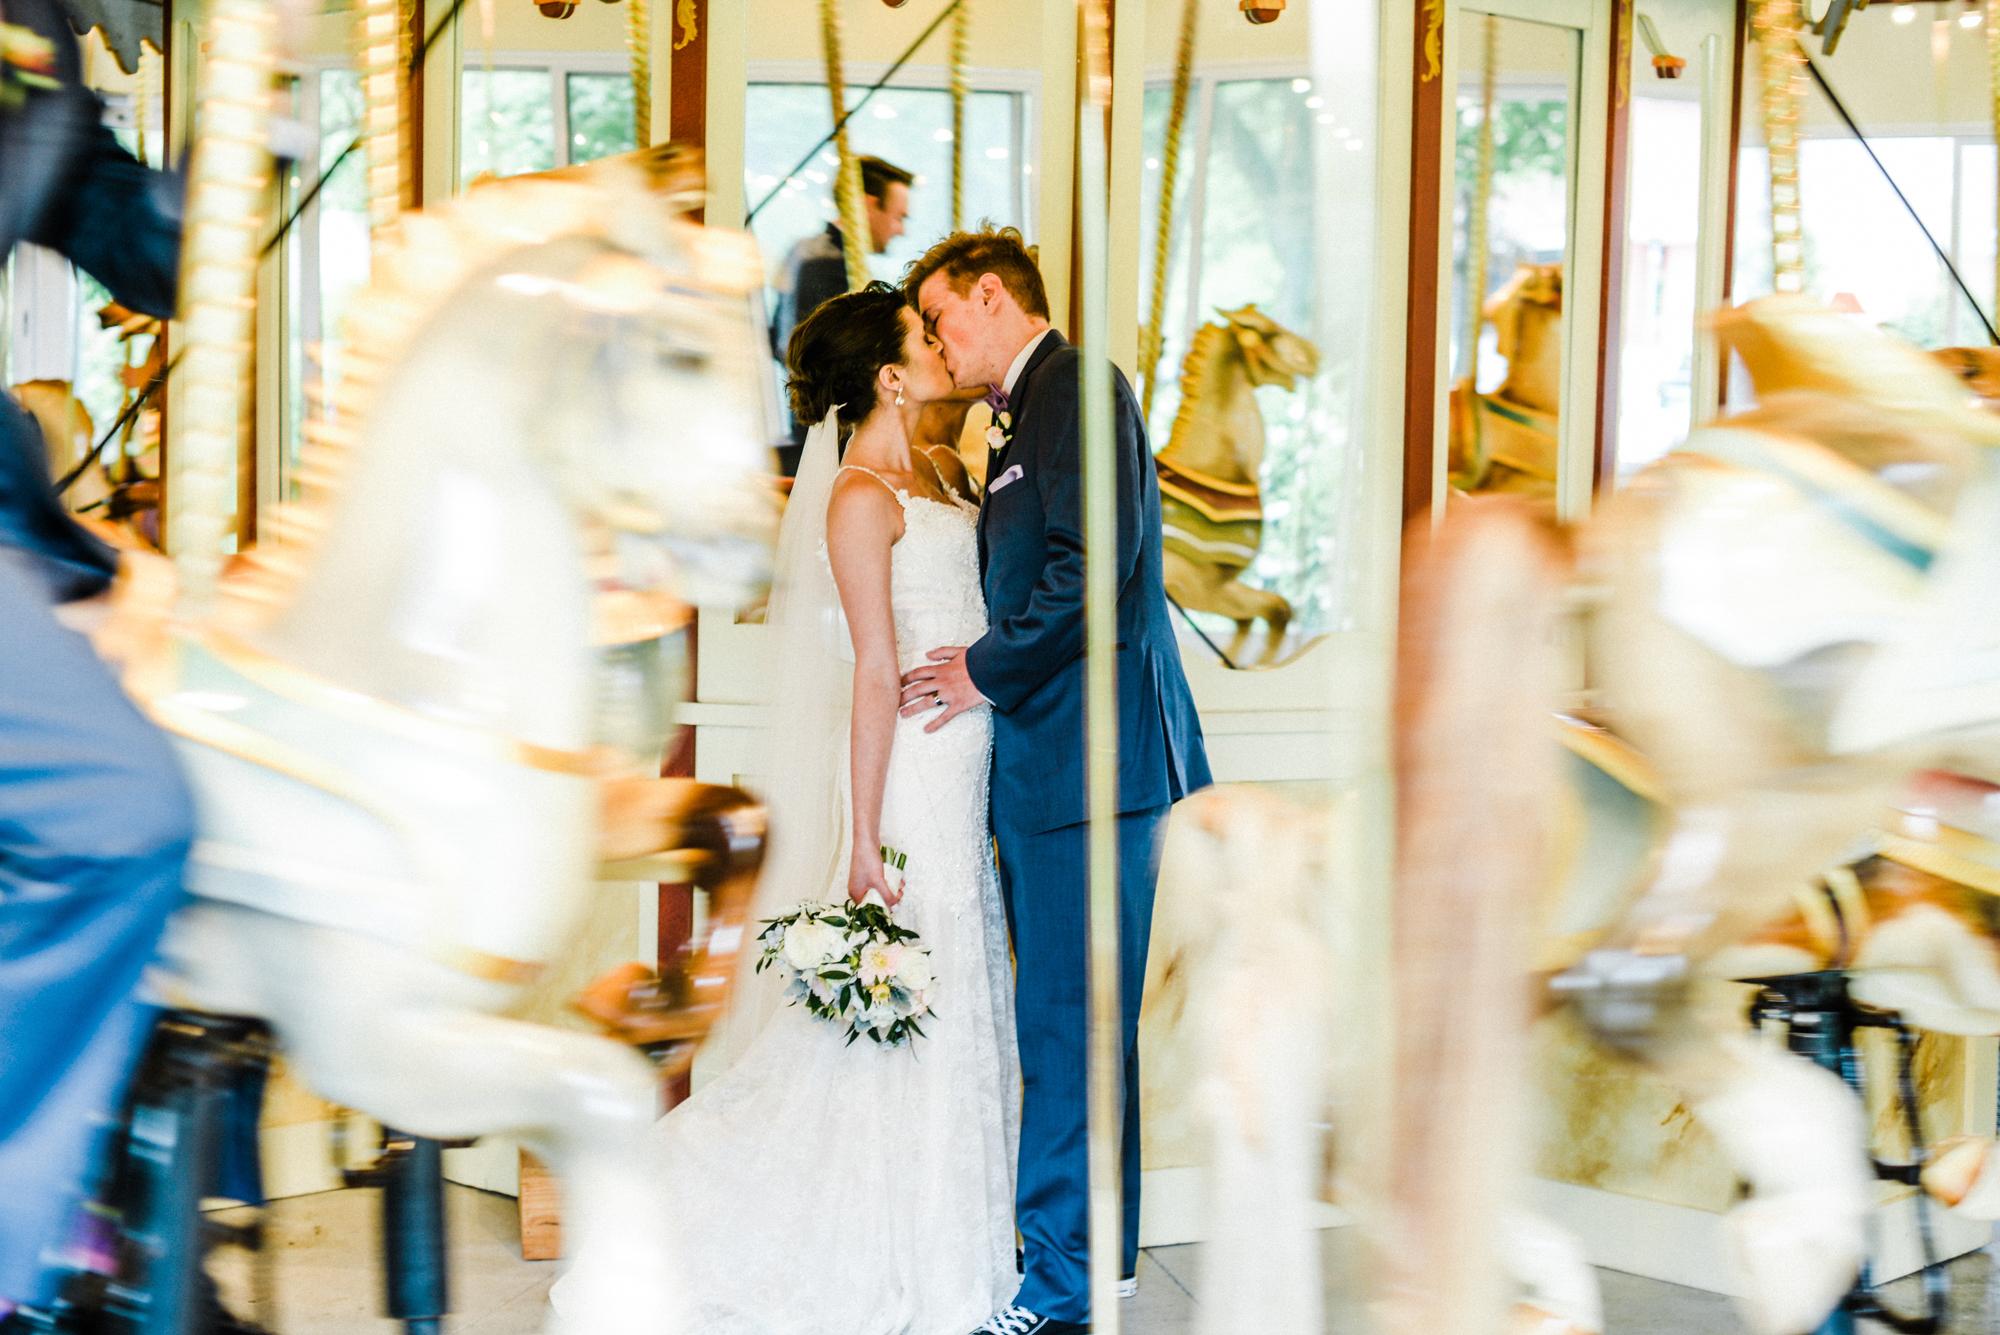 saratoga-springs-national-dance-eclectic-downtown-charlotte-film-wedding-photographer-carousel-12.jpg